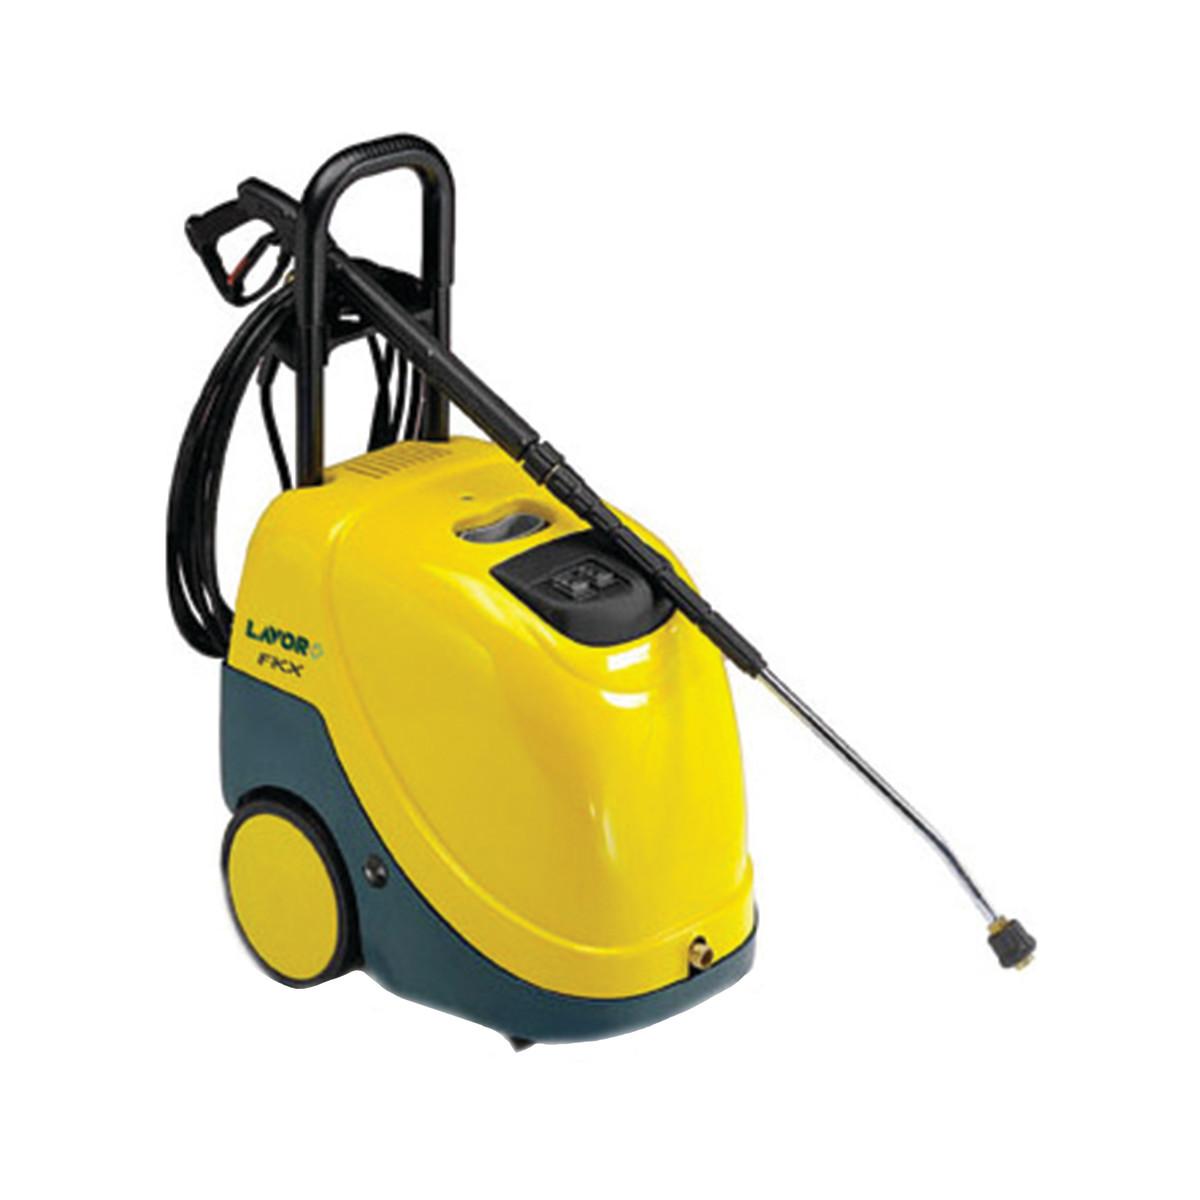 Lavorwash idropulitrice ad acqua fredda 2100 watt prezzo - Dalep 2100 leroy merlin ...